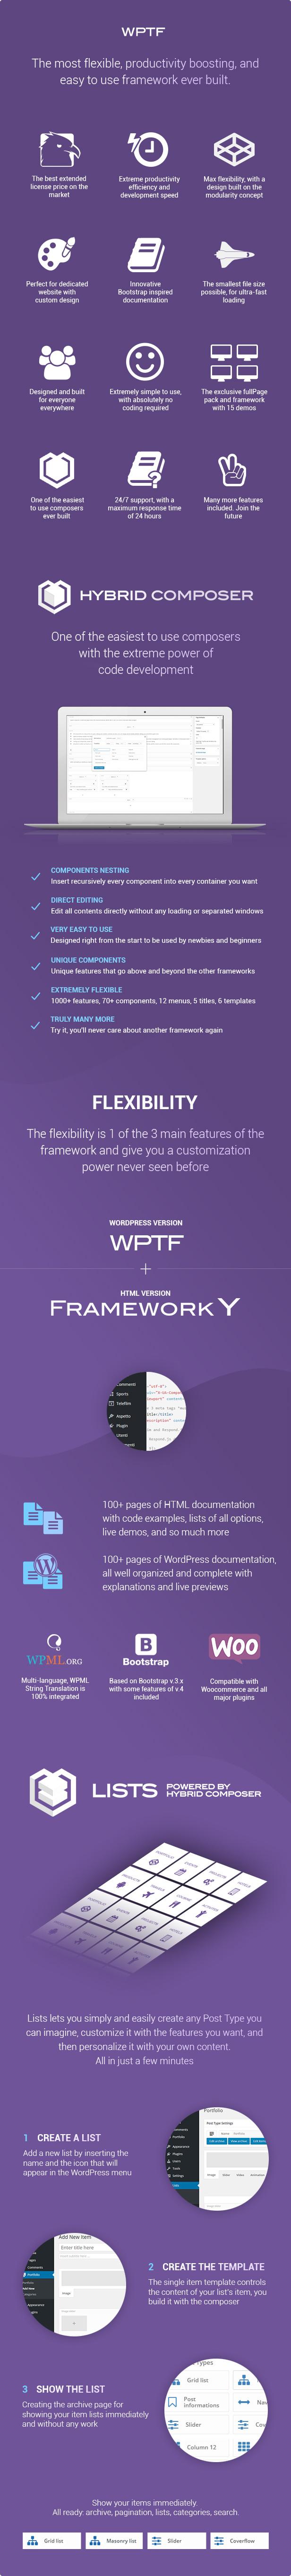 WPTF - WordPress Theme Framework & fullPage Framework 3